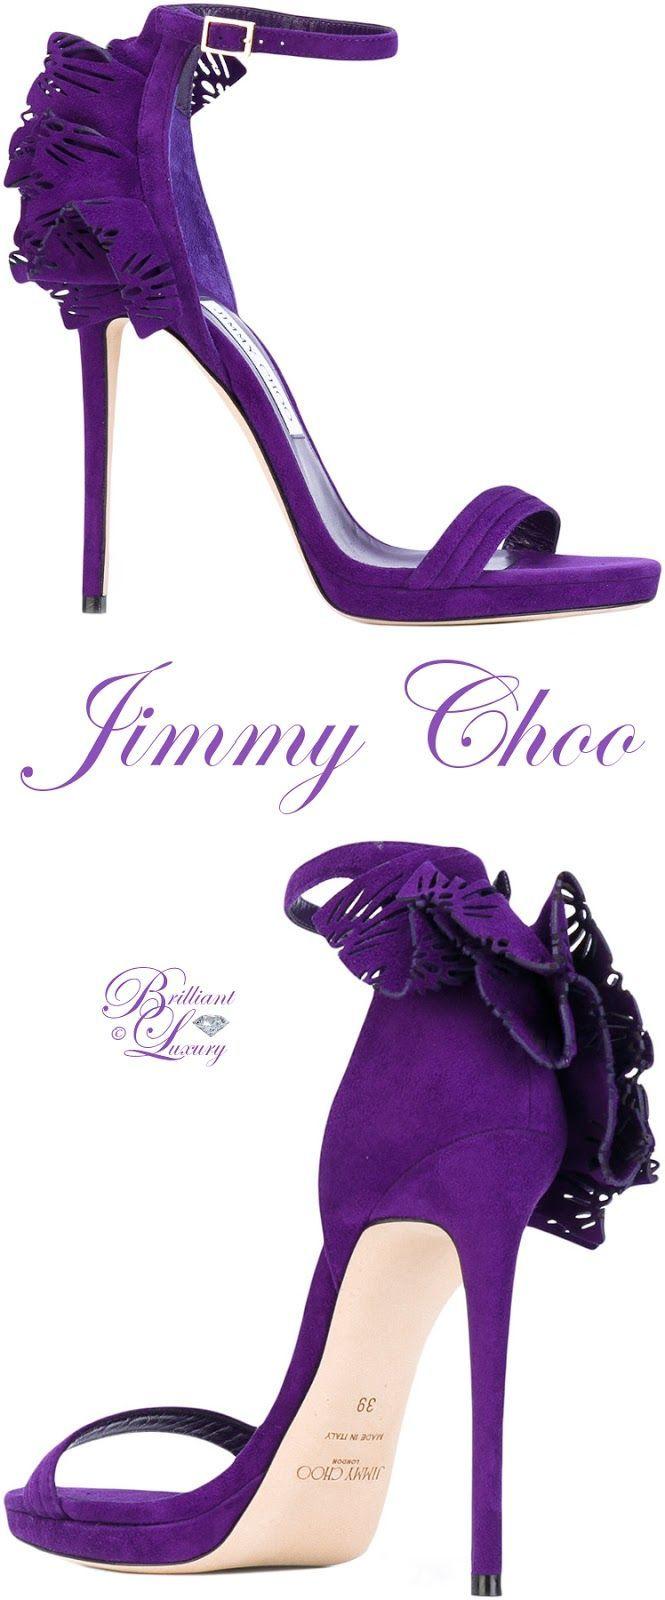 Brilliant Luxury by Emmy DE ♦ Jimmy Choo Kelly Sandals